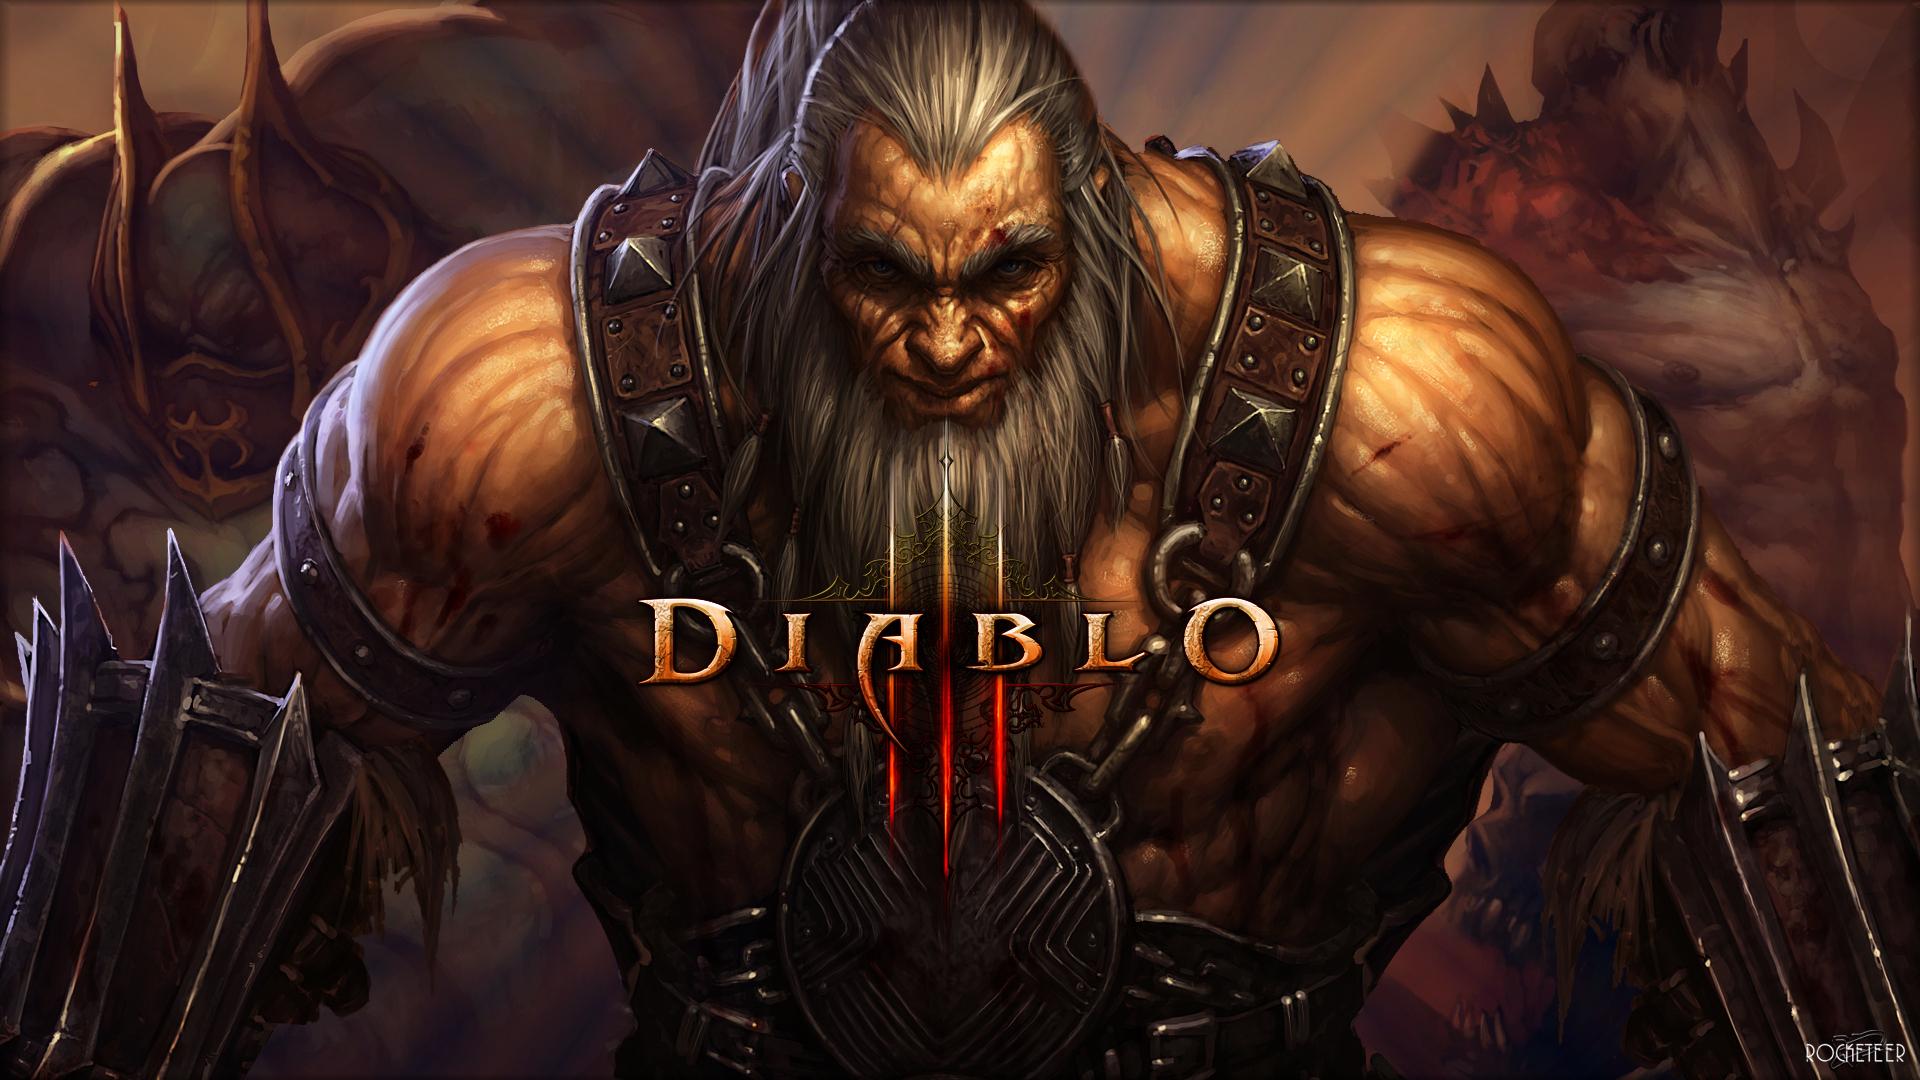 Diablo III Full HD Wallpaper and Background 1920x1080 1920x1080